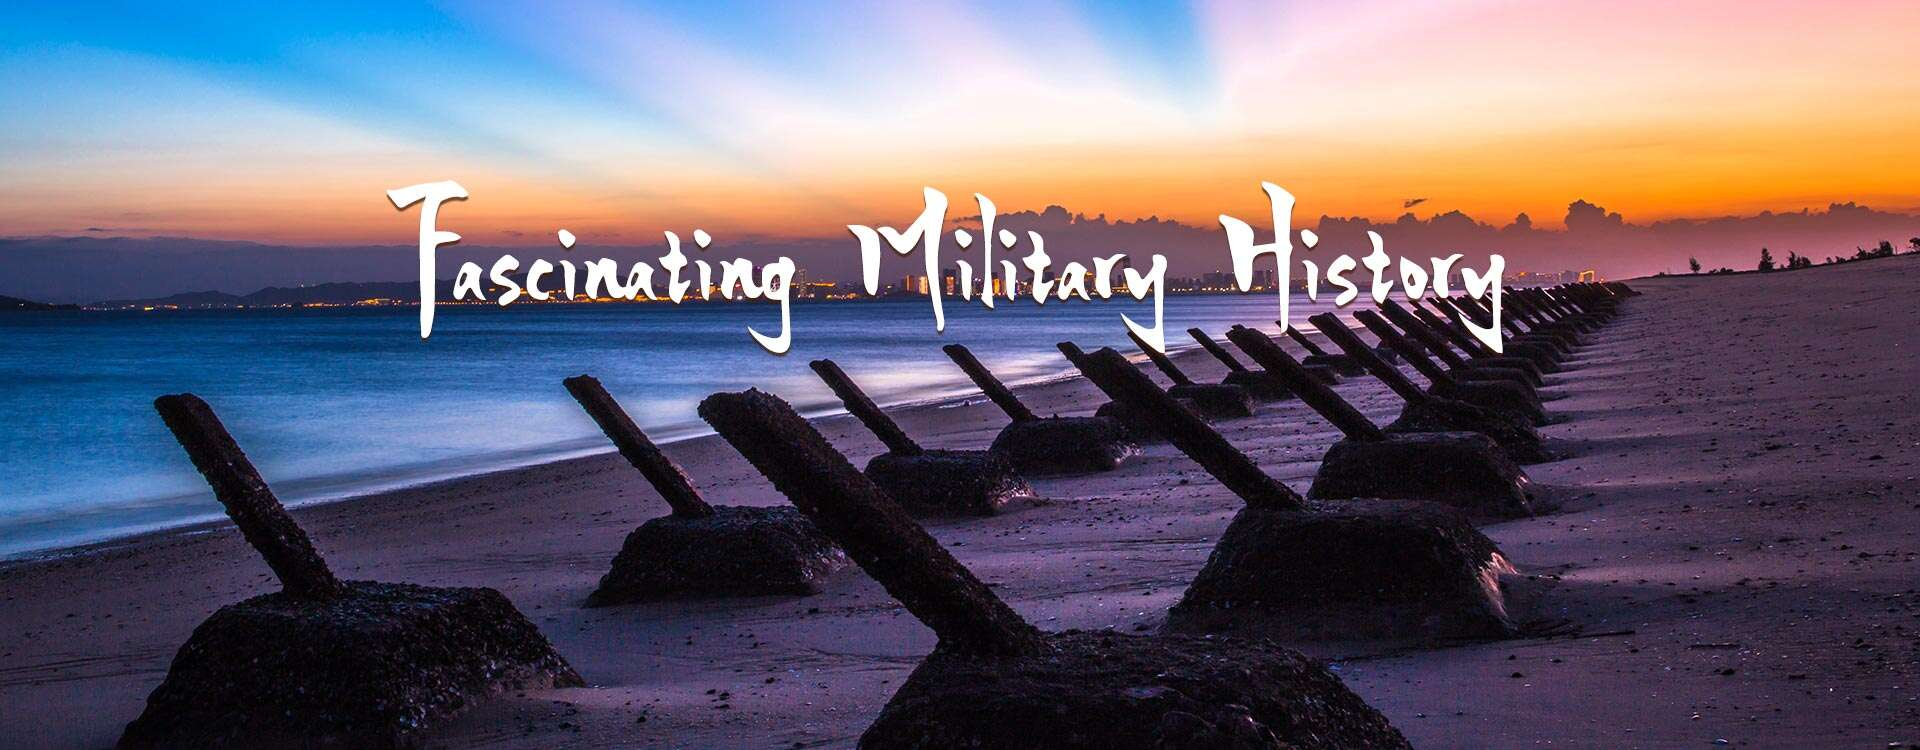 Fascinating Military History